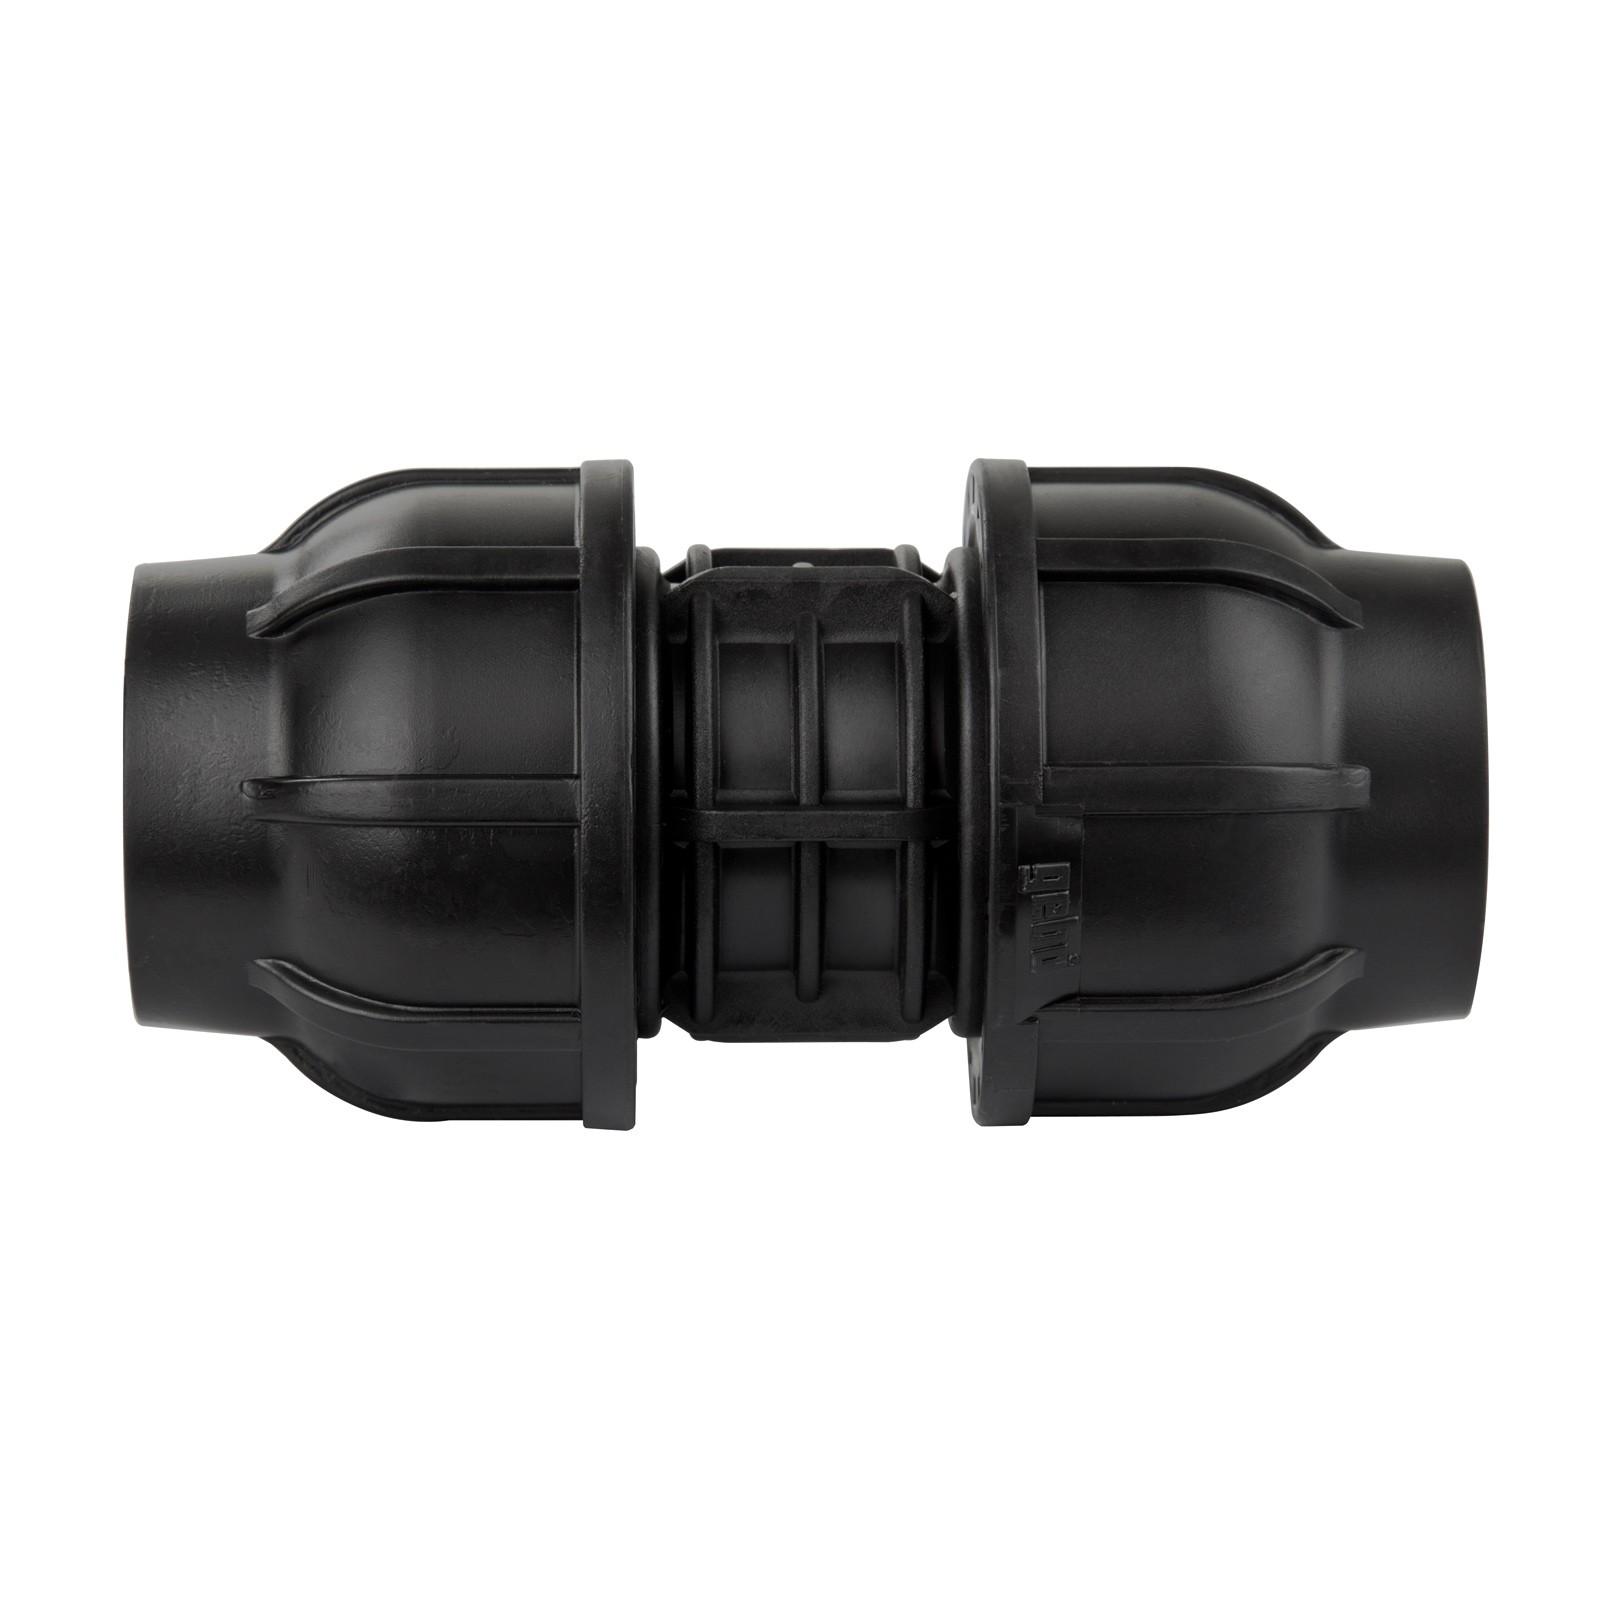 pe rohr kupplung 25 x 20 mm reduzierung reduktion bergang verschraubung fitting ebay. Black Bedroom Furniture Sets. Home Design Ideas